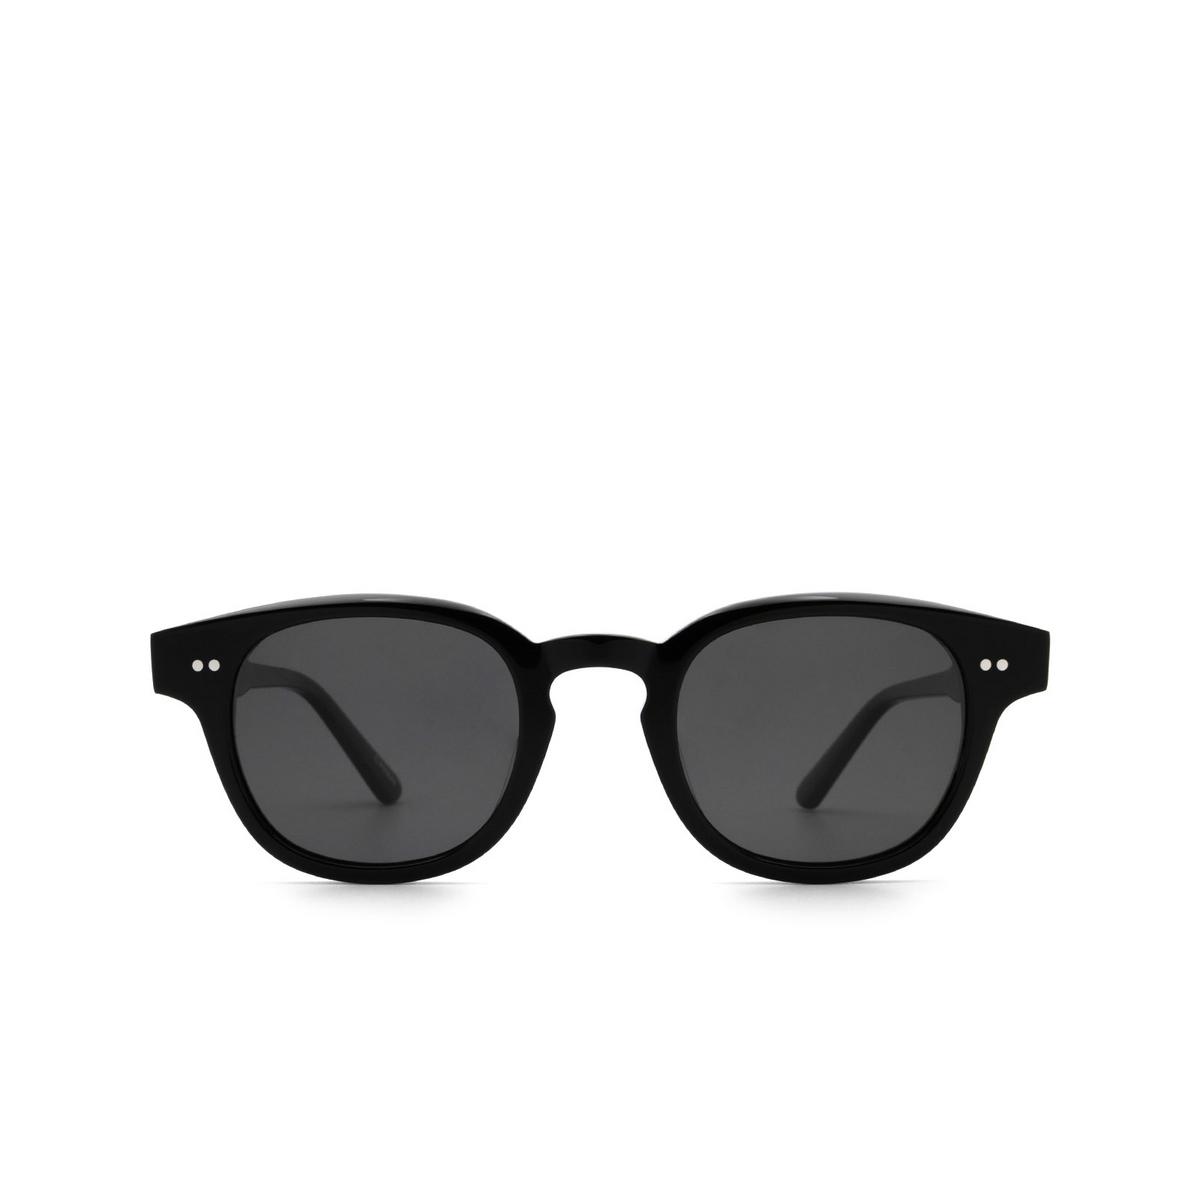 Chimi® Square Sunglasses: 01 color Black - front view.